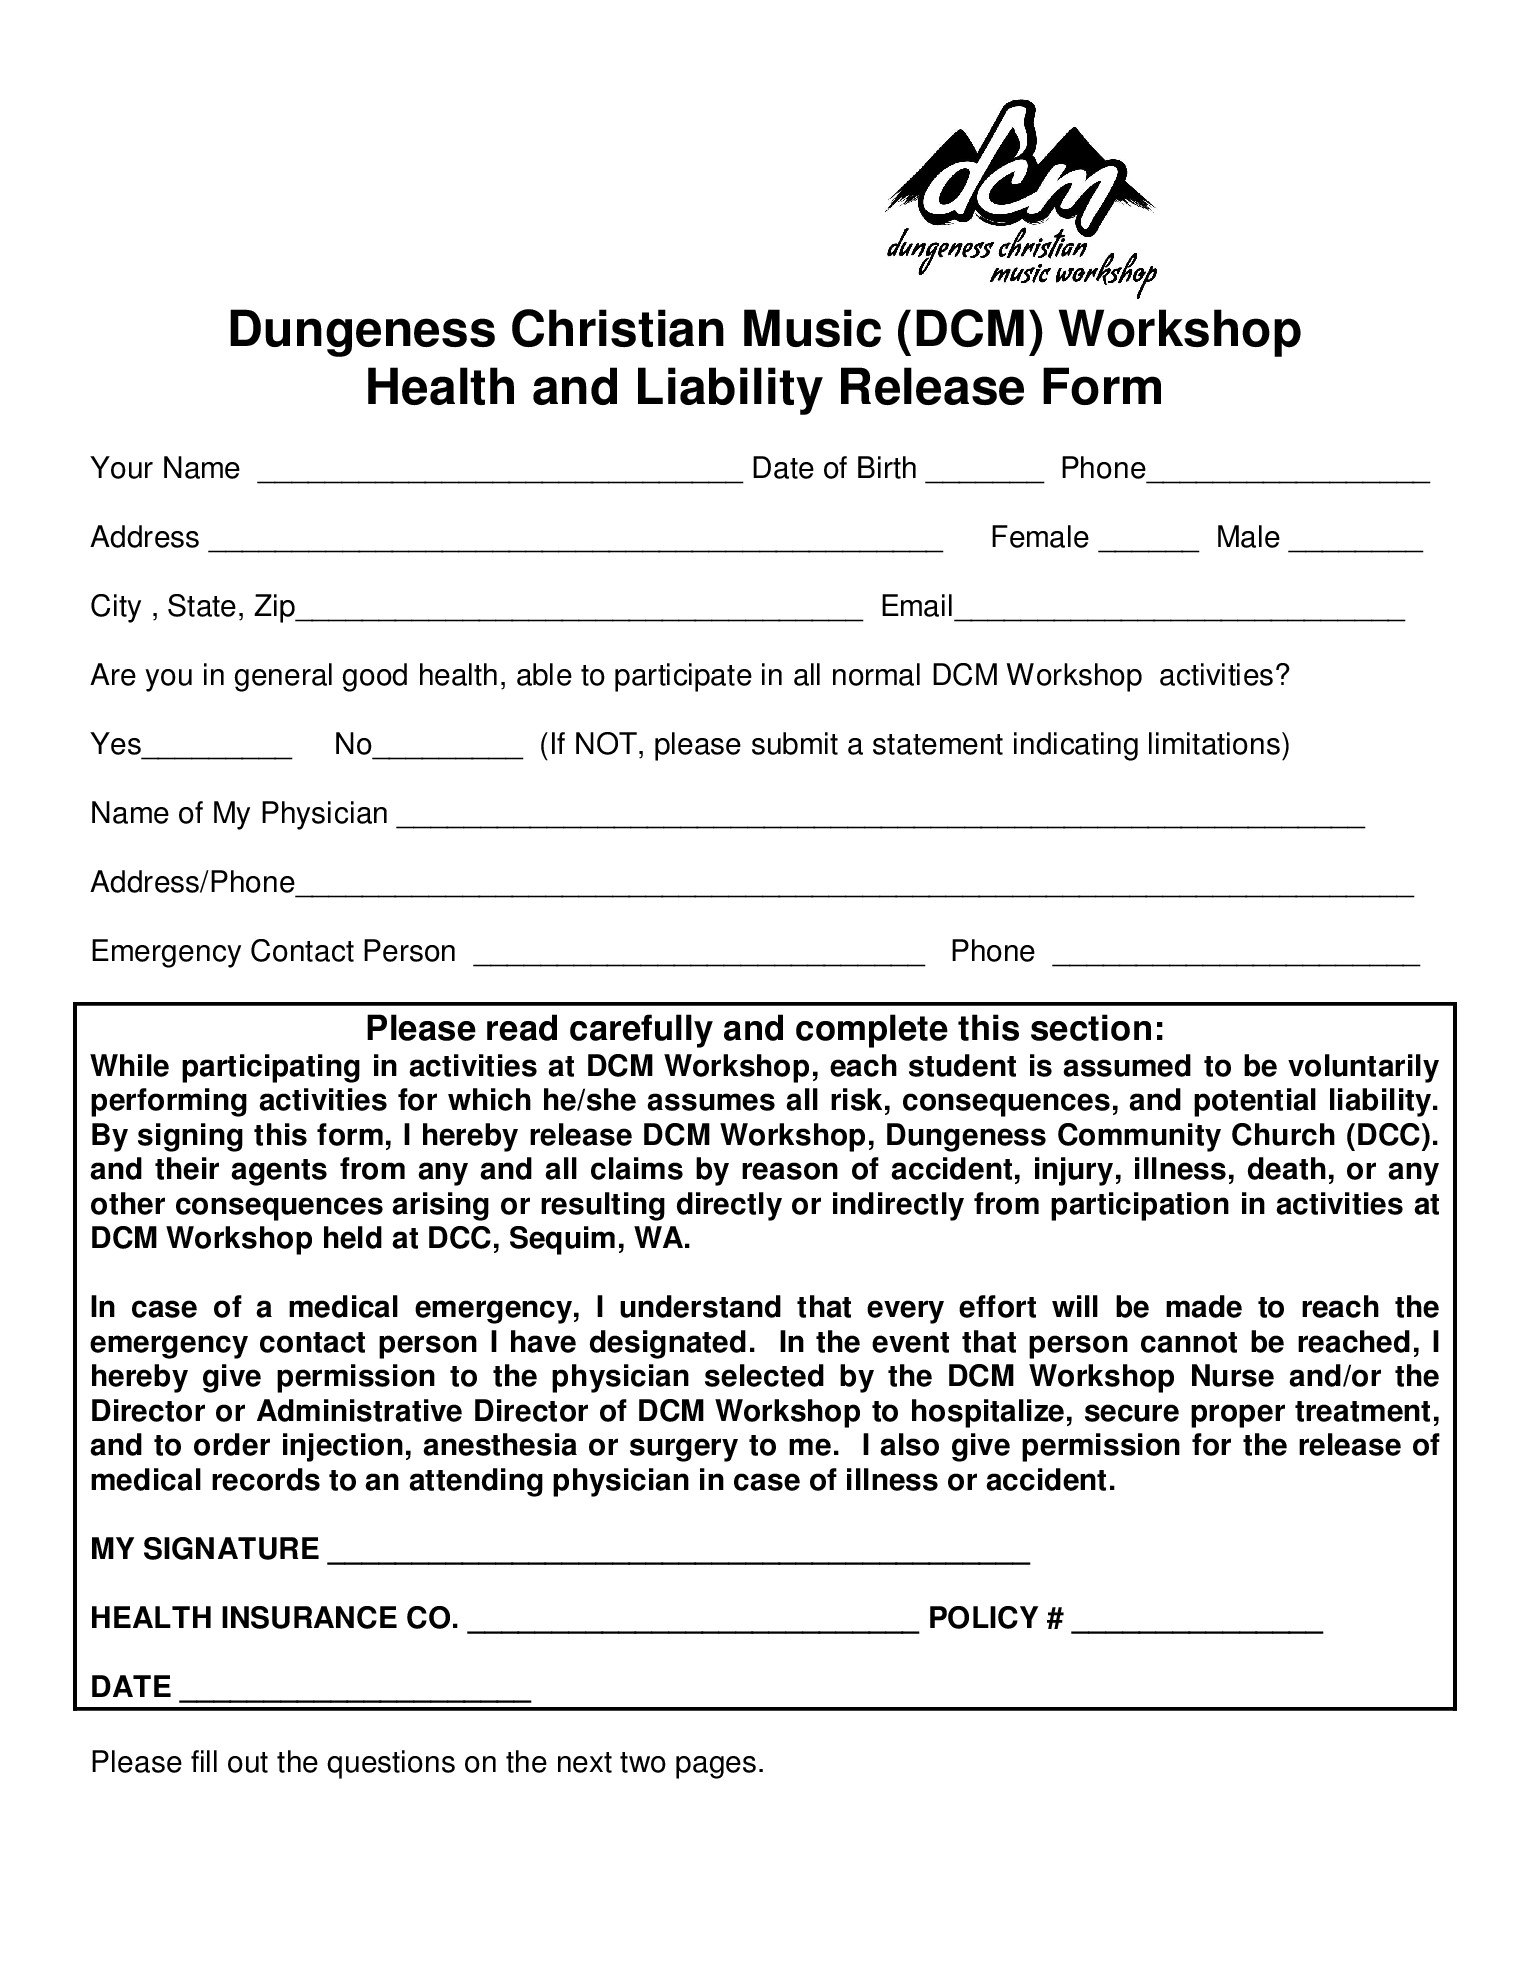 Adult christian music